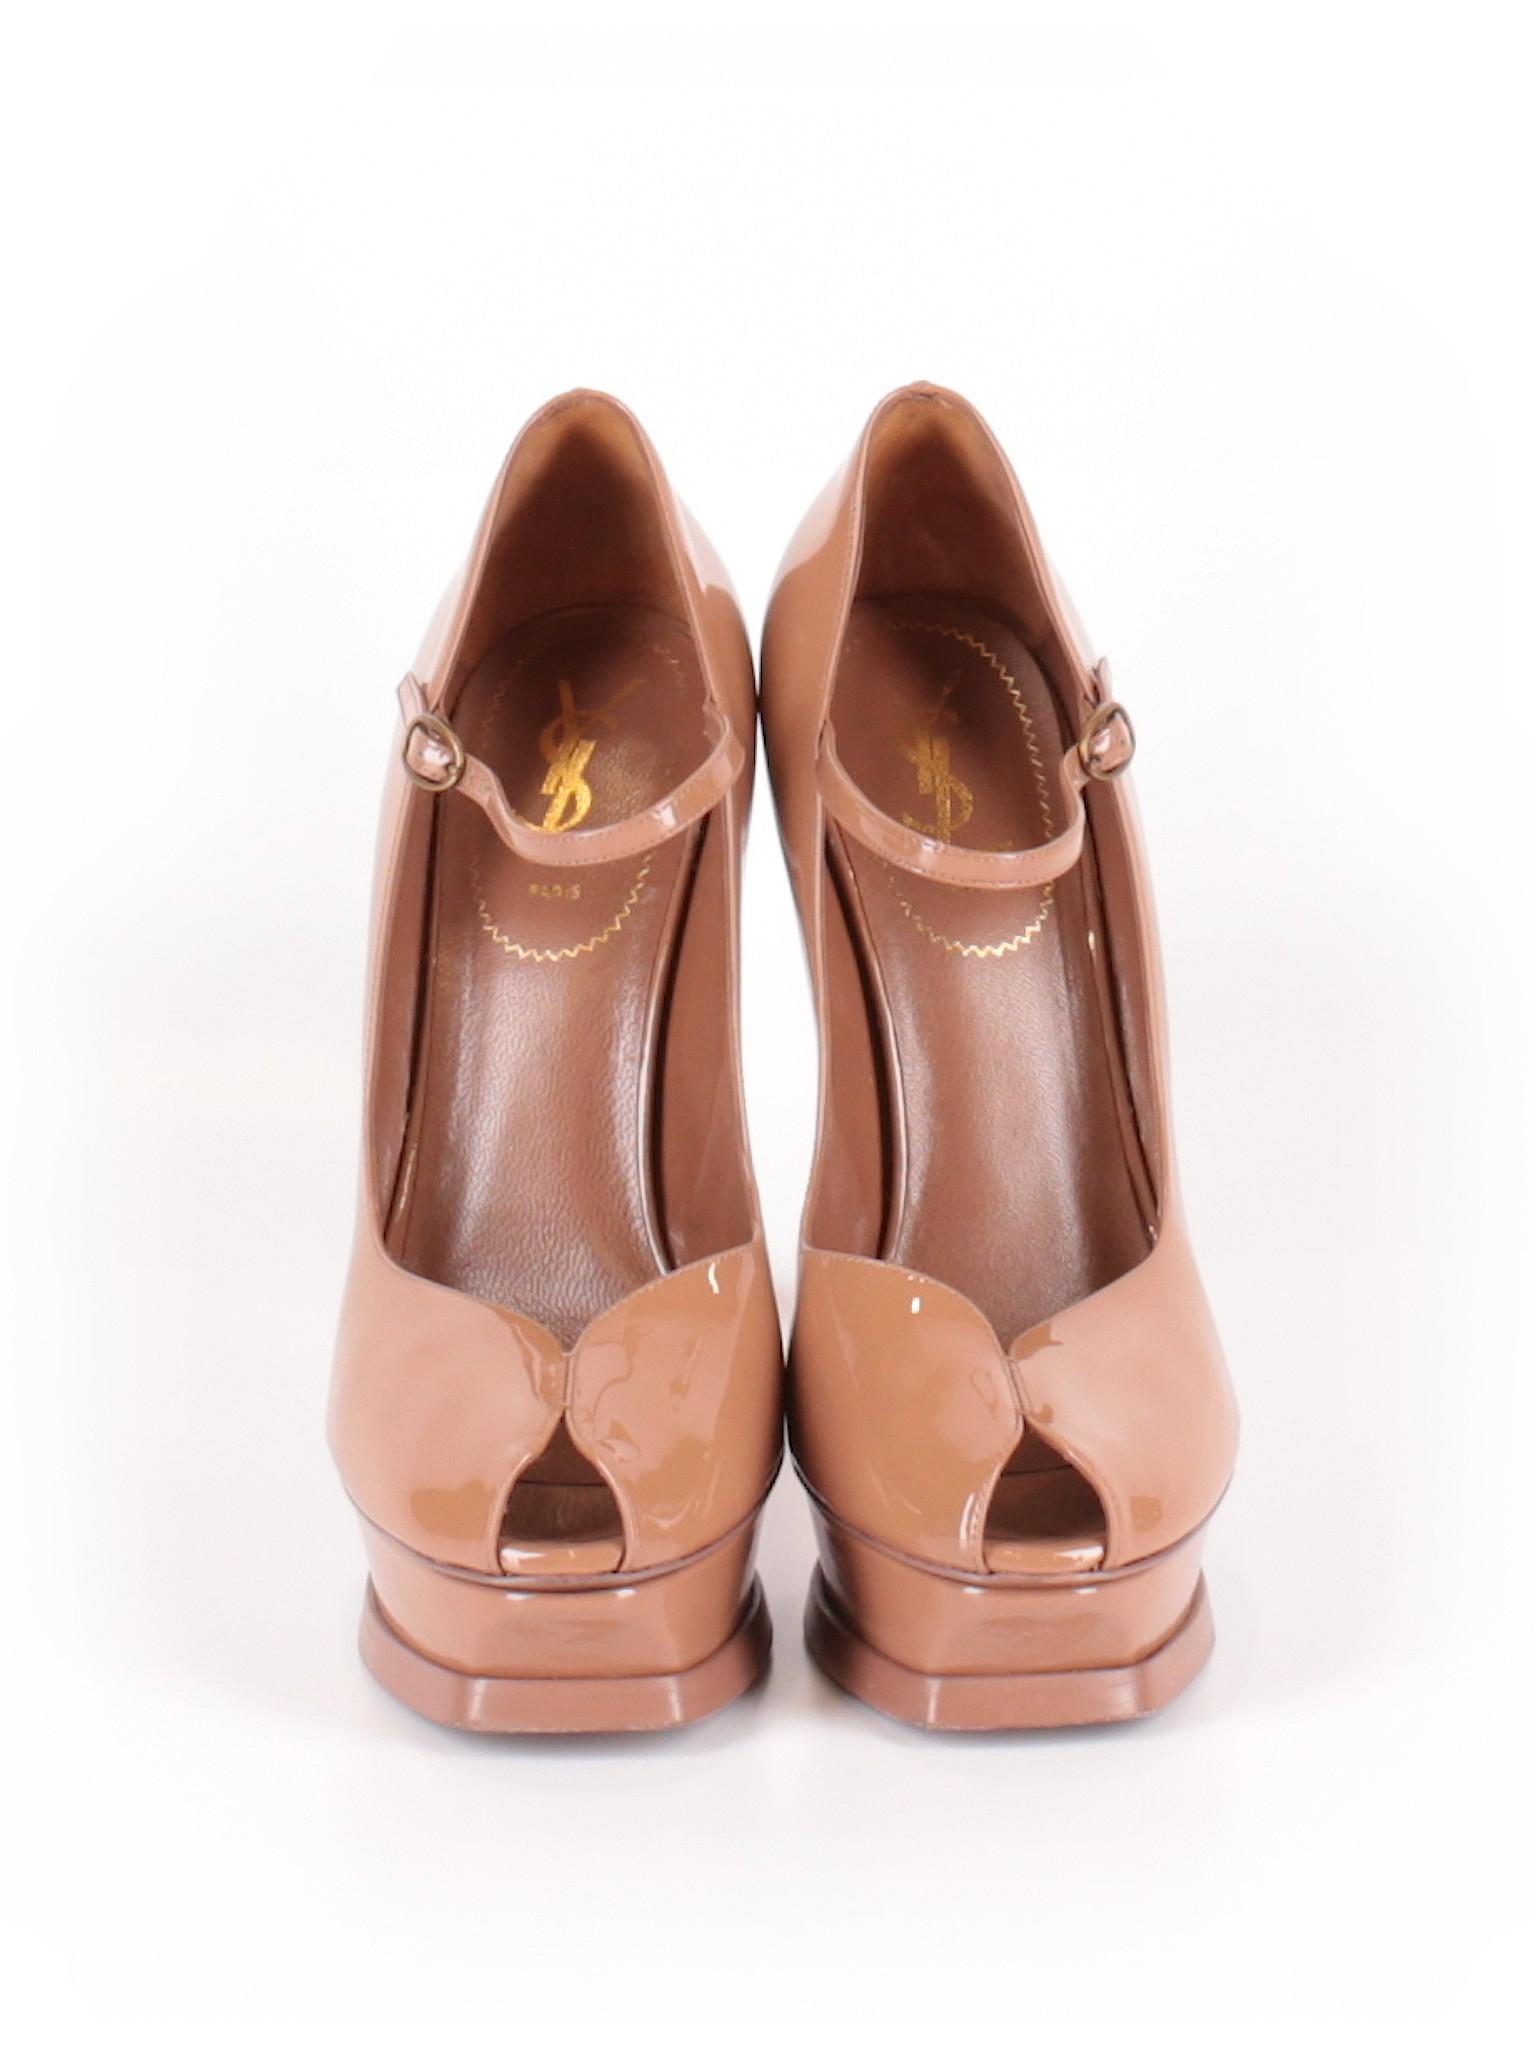 4c303ef7164 Yves Saint Laurent 100% Leather Solid Tan Heels Size 40 (EU) - 76% off |  thredUP